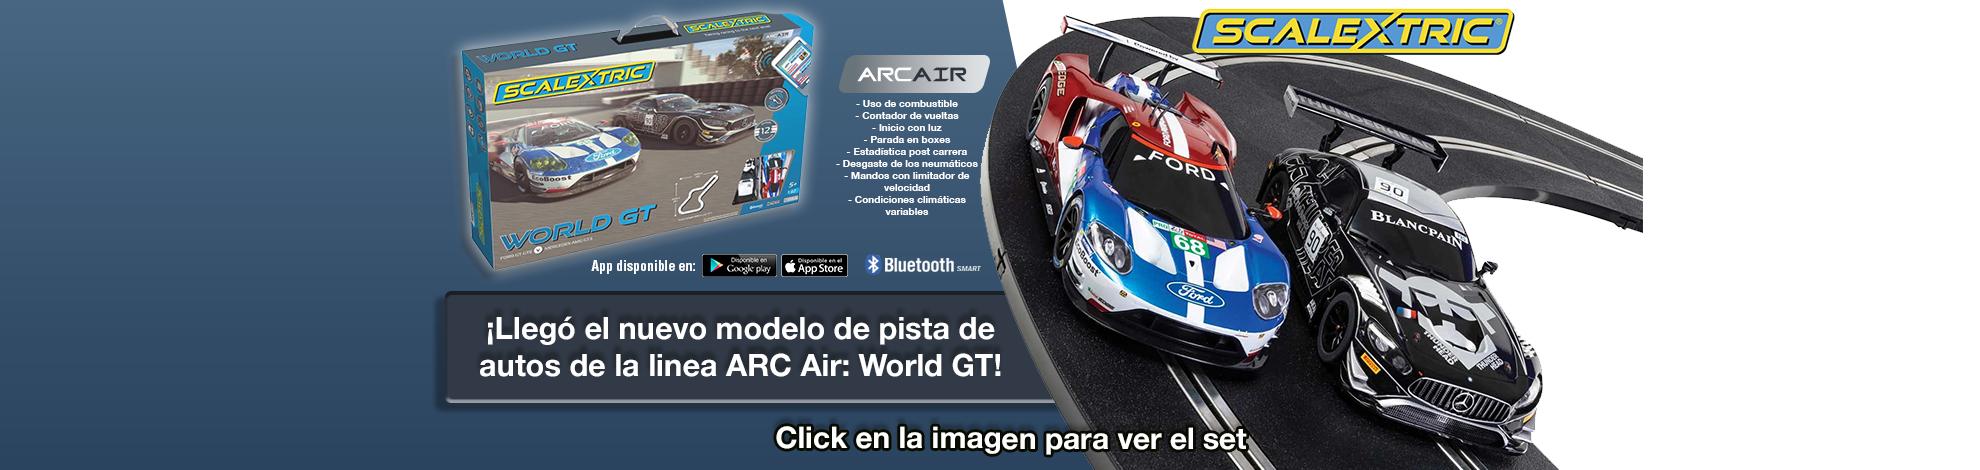 World GT